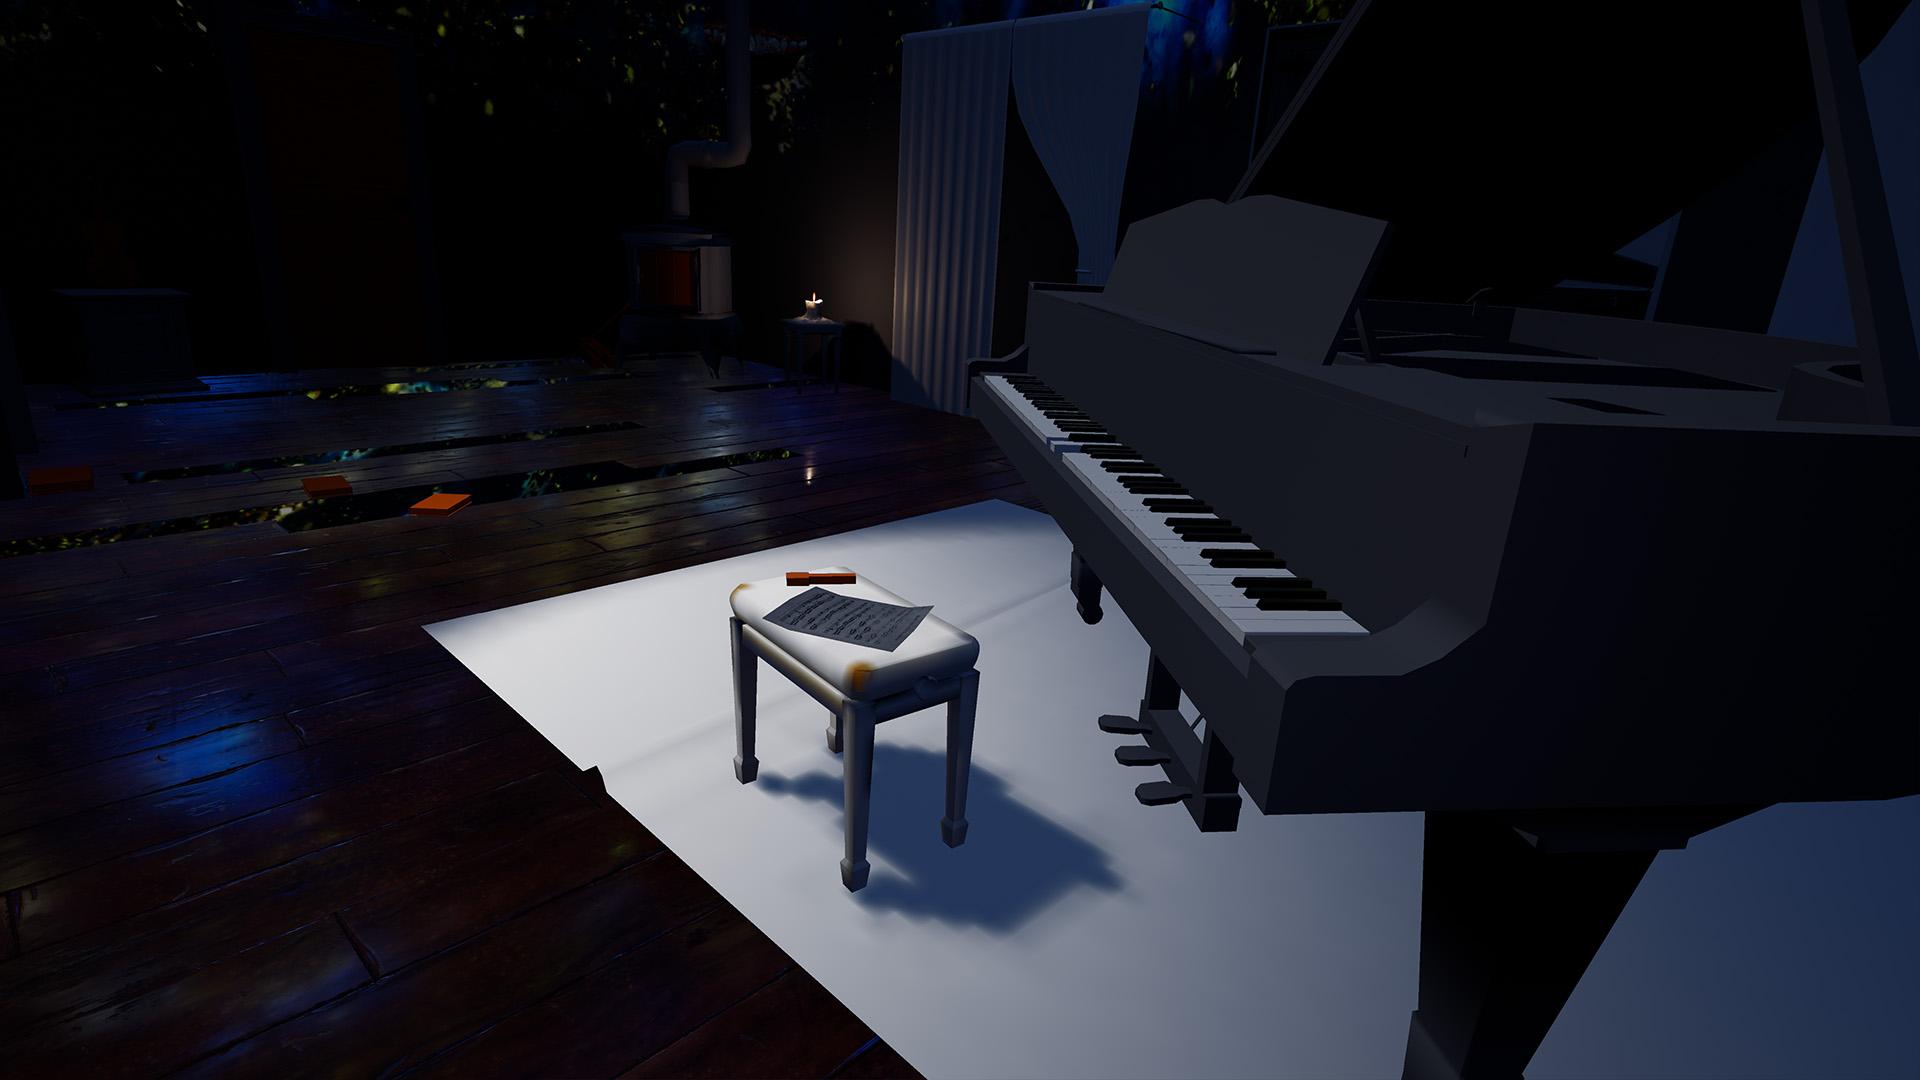 Piano in dark room